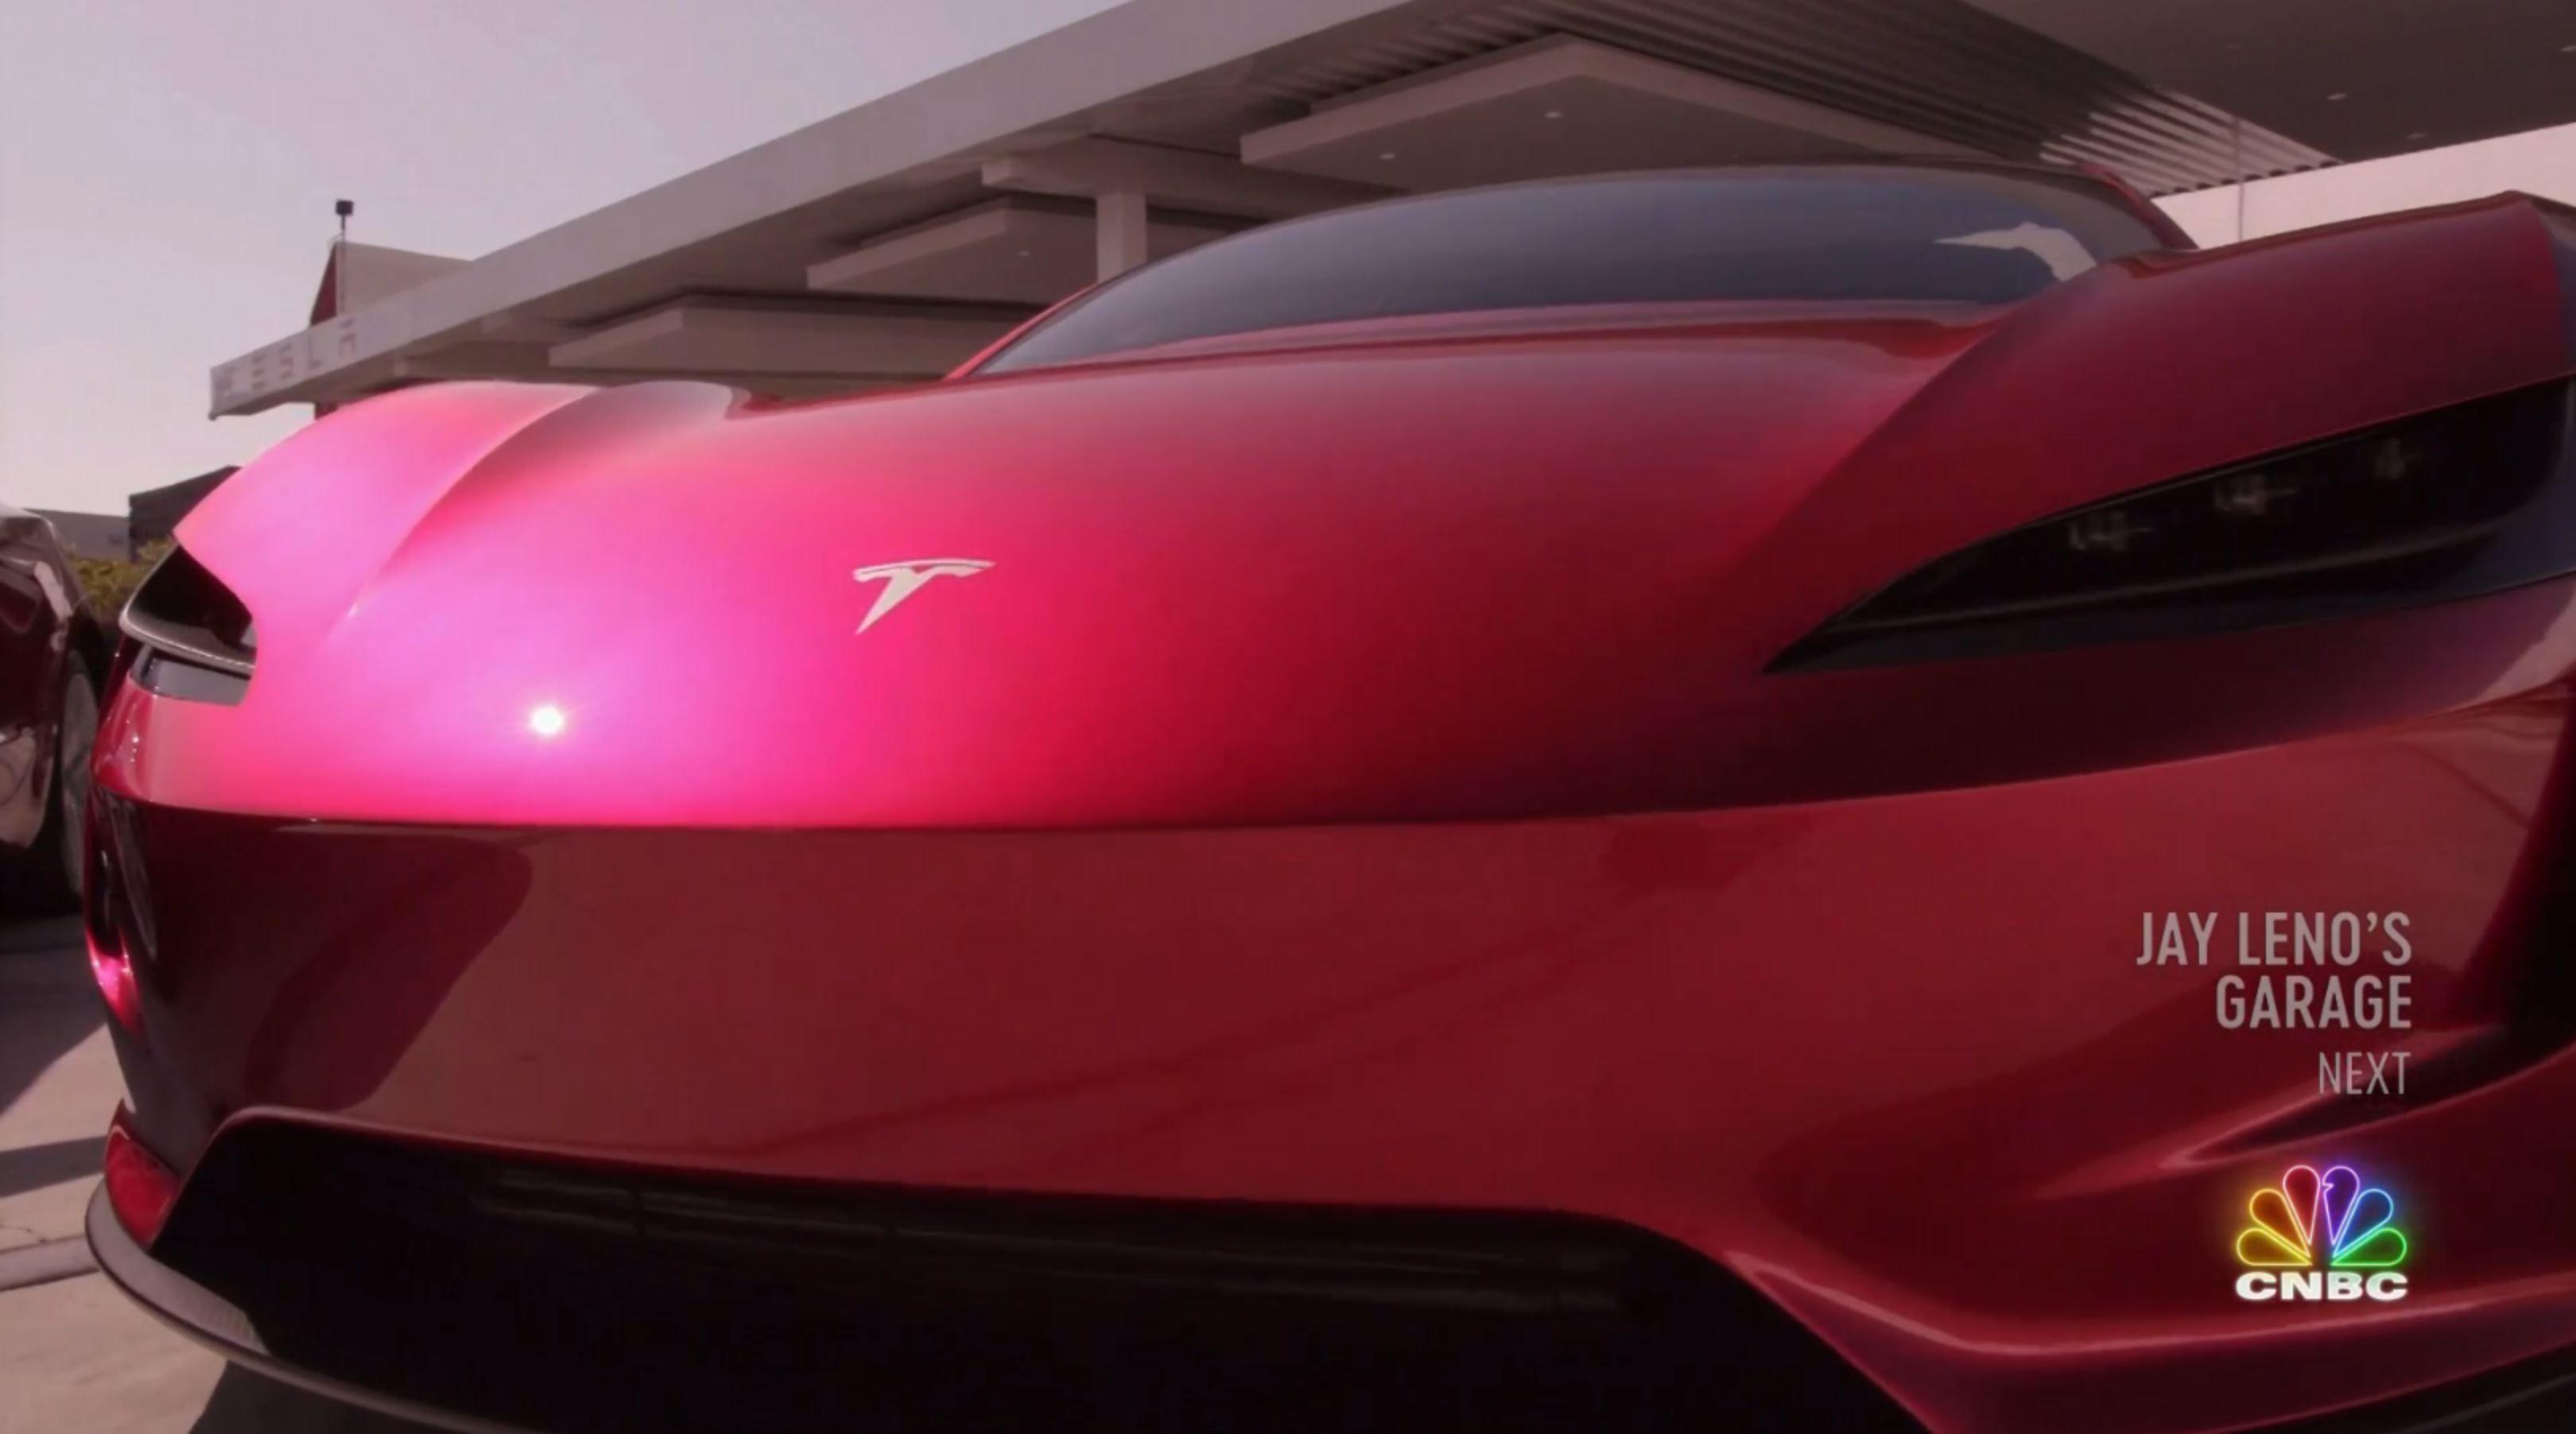 Jay Leno Tesla Franz segment (NBC) 14